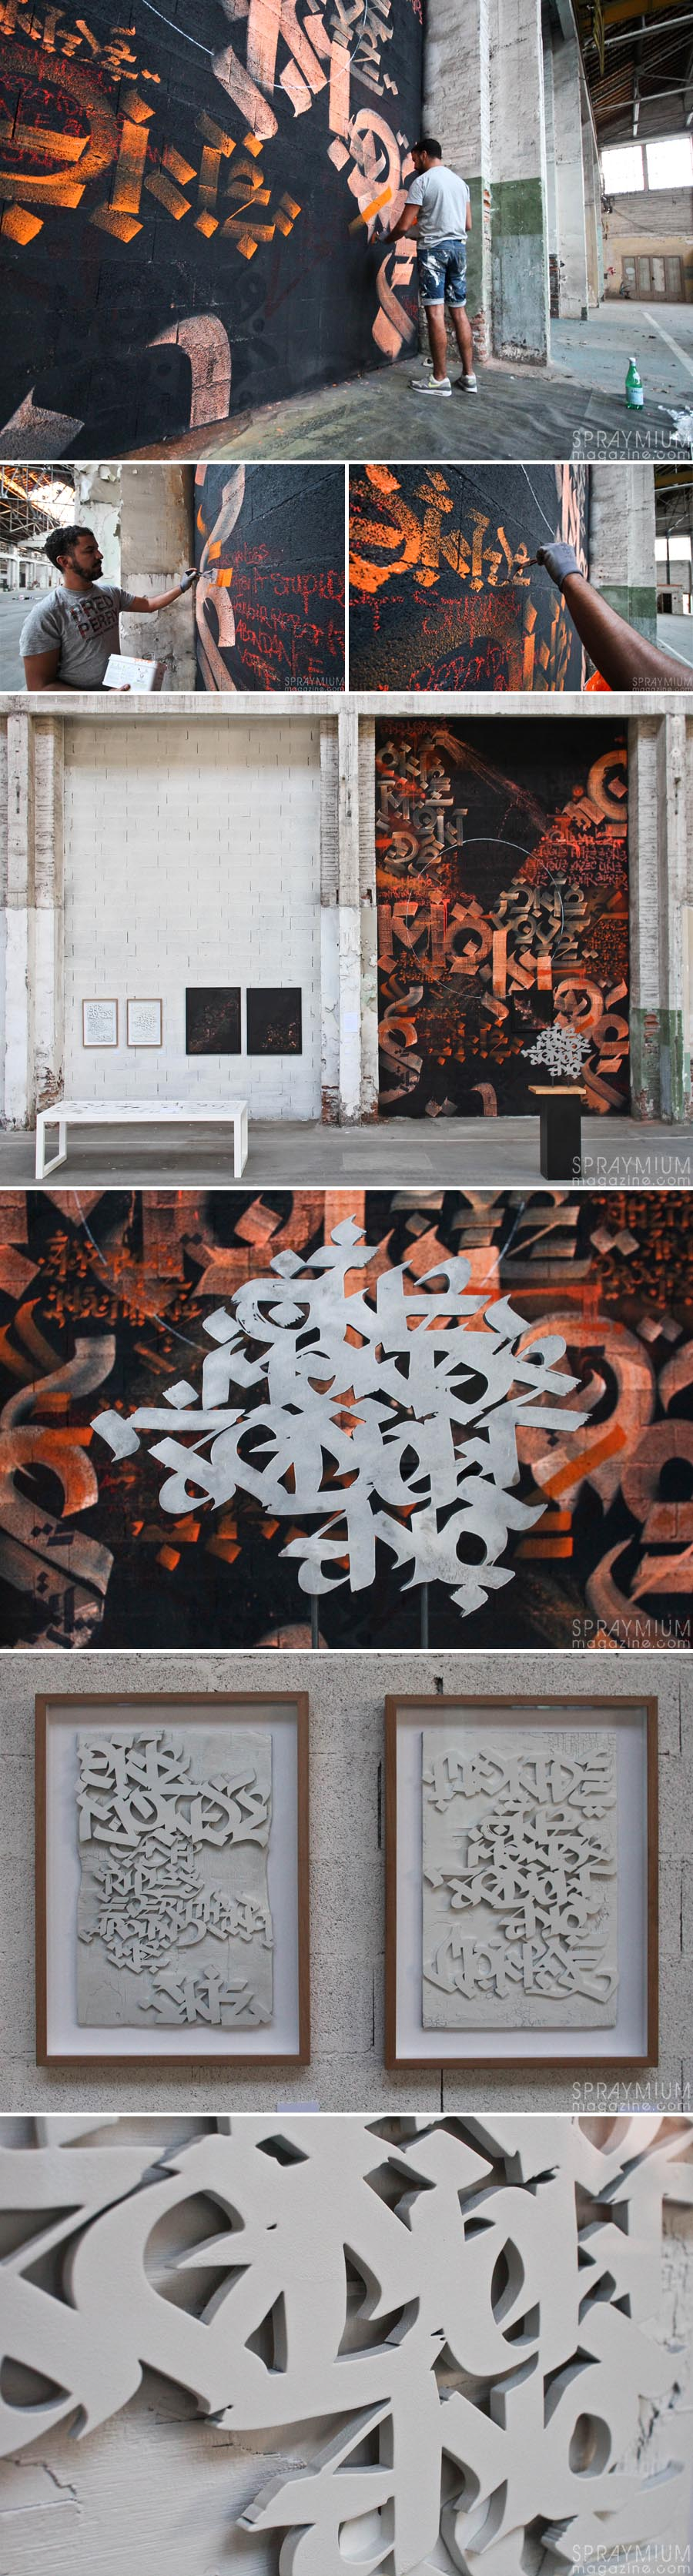 mister freeze 2016 toulouse fauteograff der fenx fishe jace kat katre korail kouka maye reso missy momies mondé panks stop poes reso sike taroe toncé walex wire wow123 zest graffiti postgraffiti street art urbain exposition spraymium